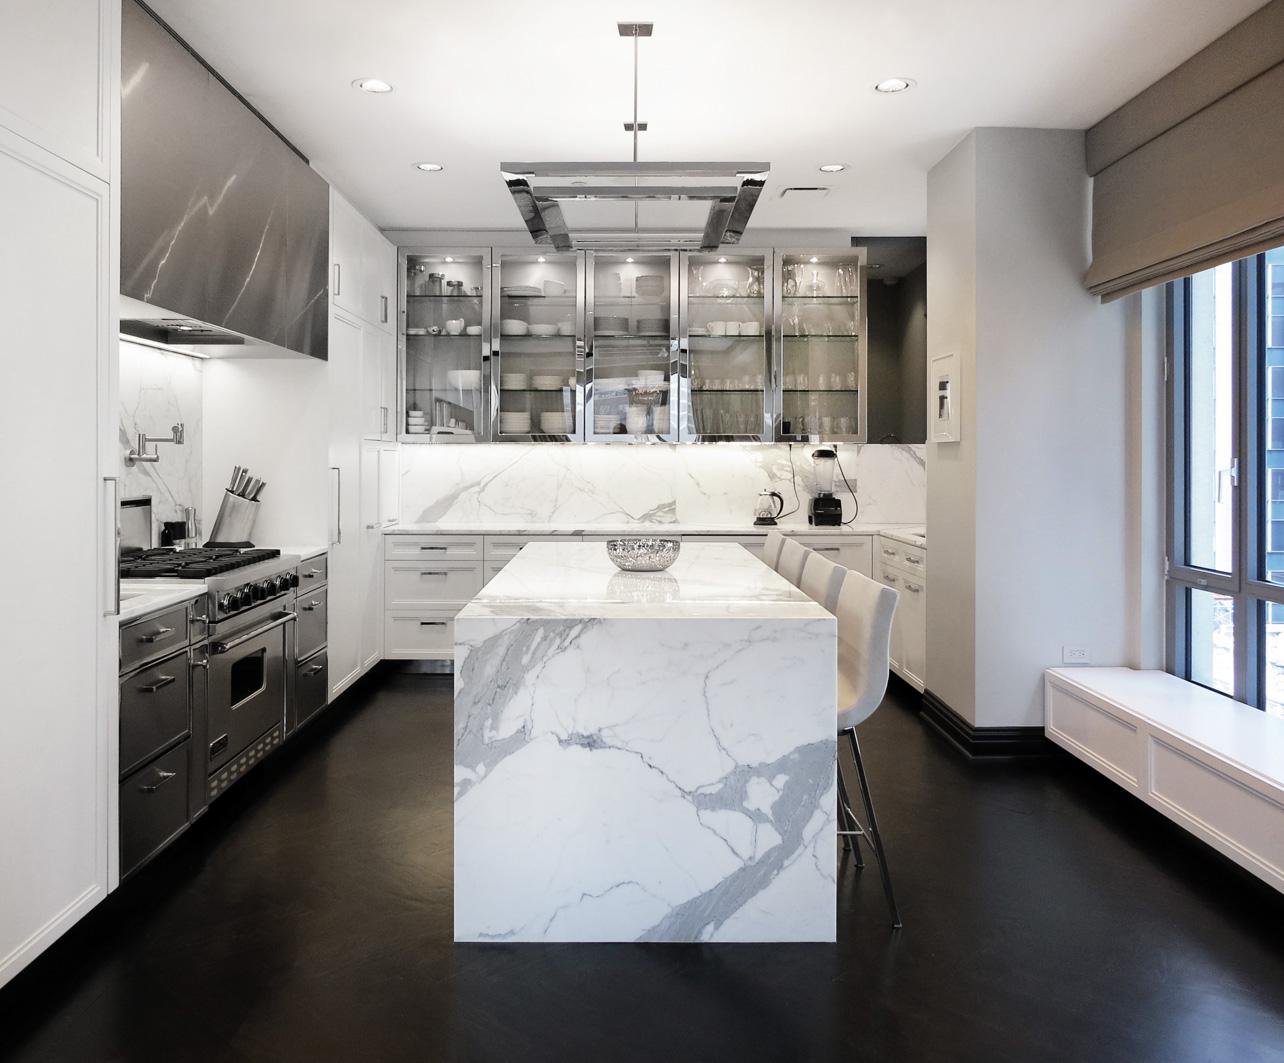 Madison_Kitchen_B.jpg